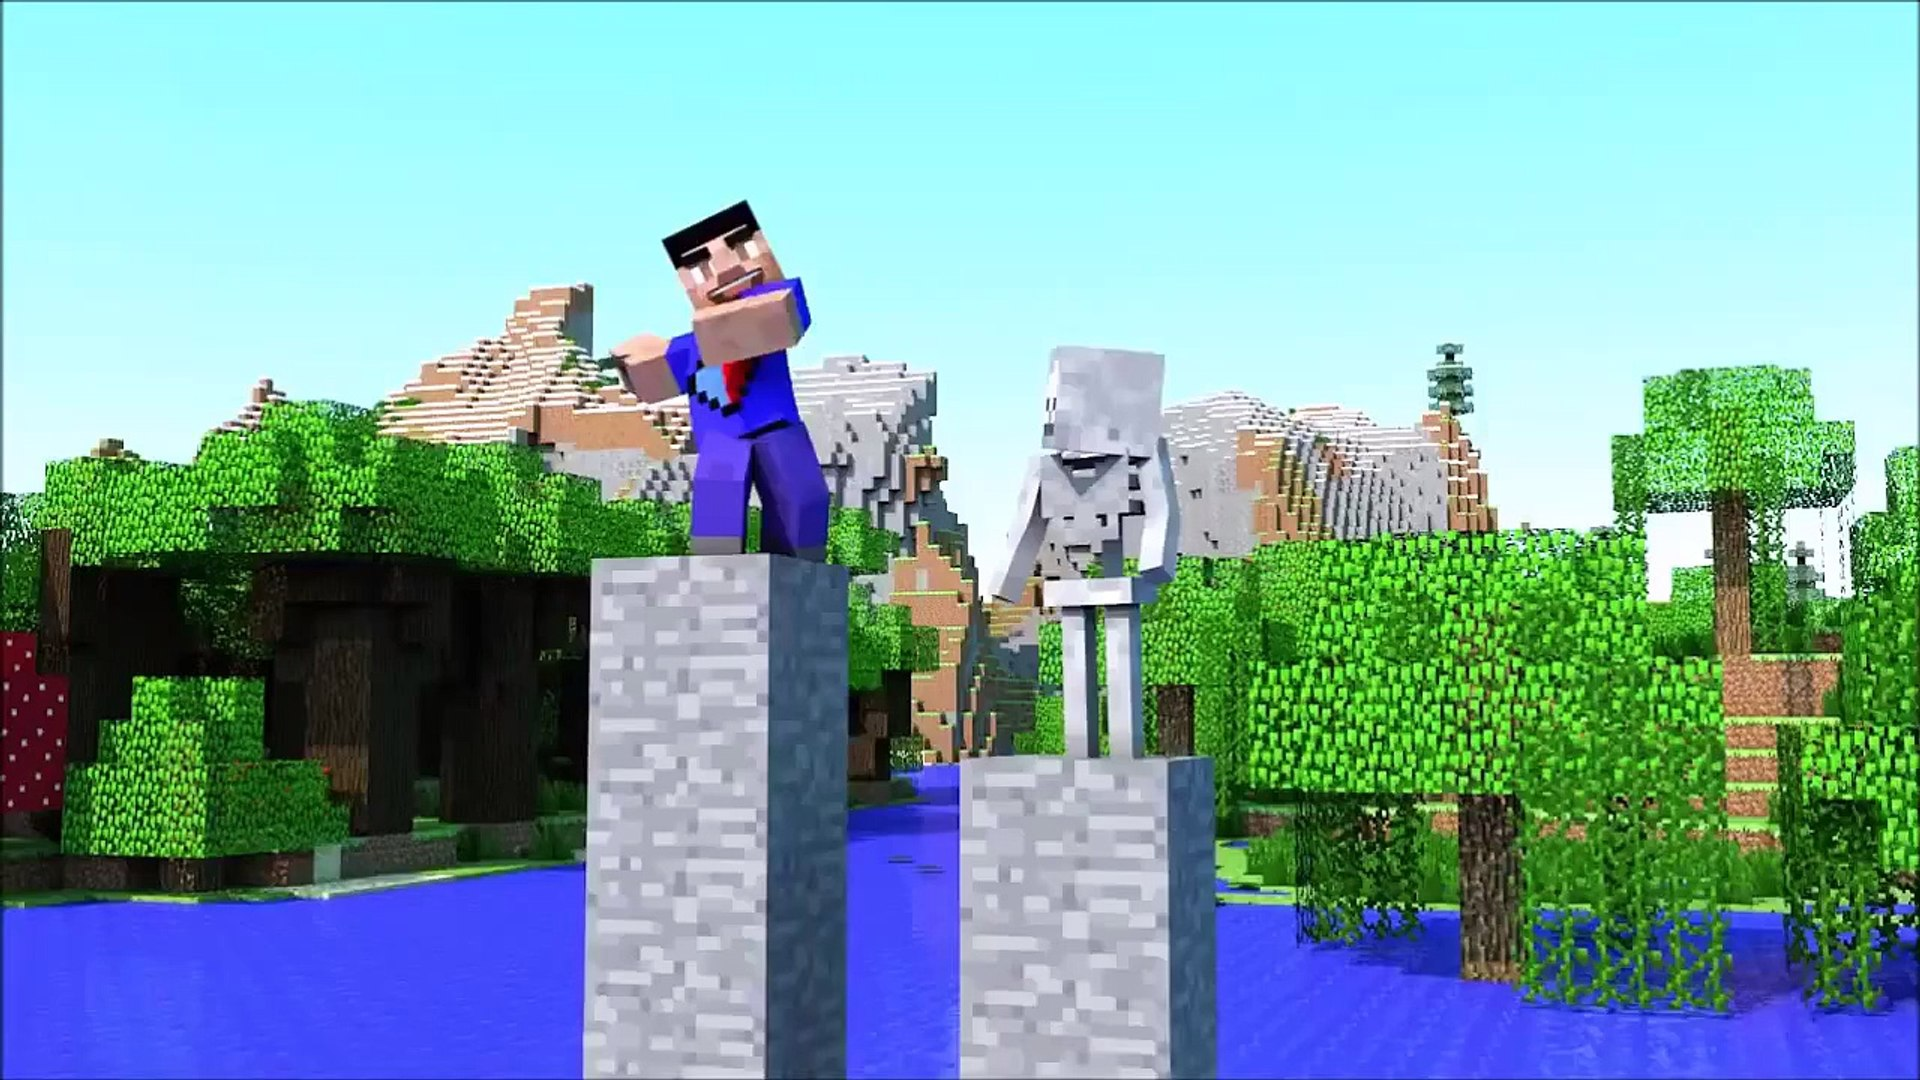 Top 5 Minecraft Songs - September 2015 - Minecraft Songs/Parodies